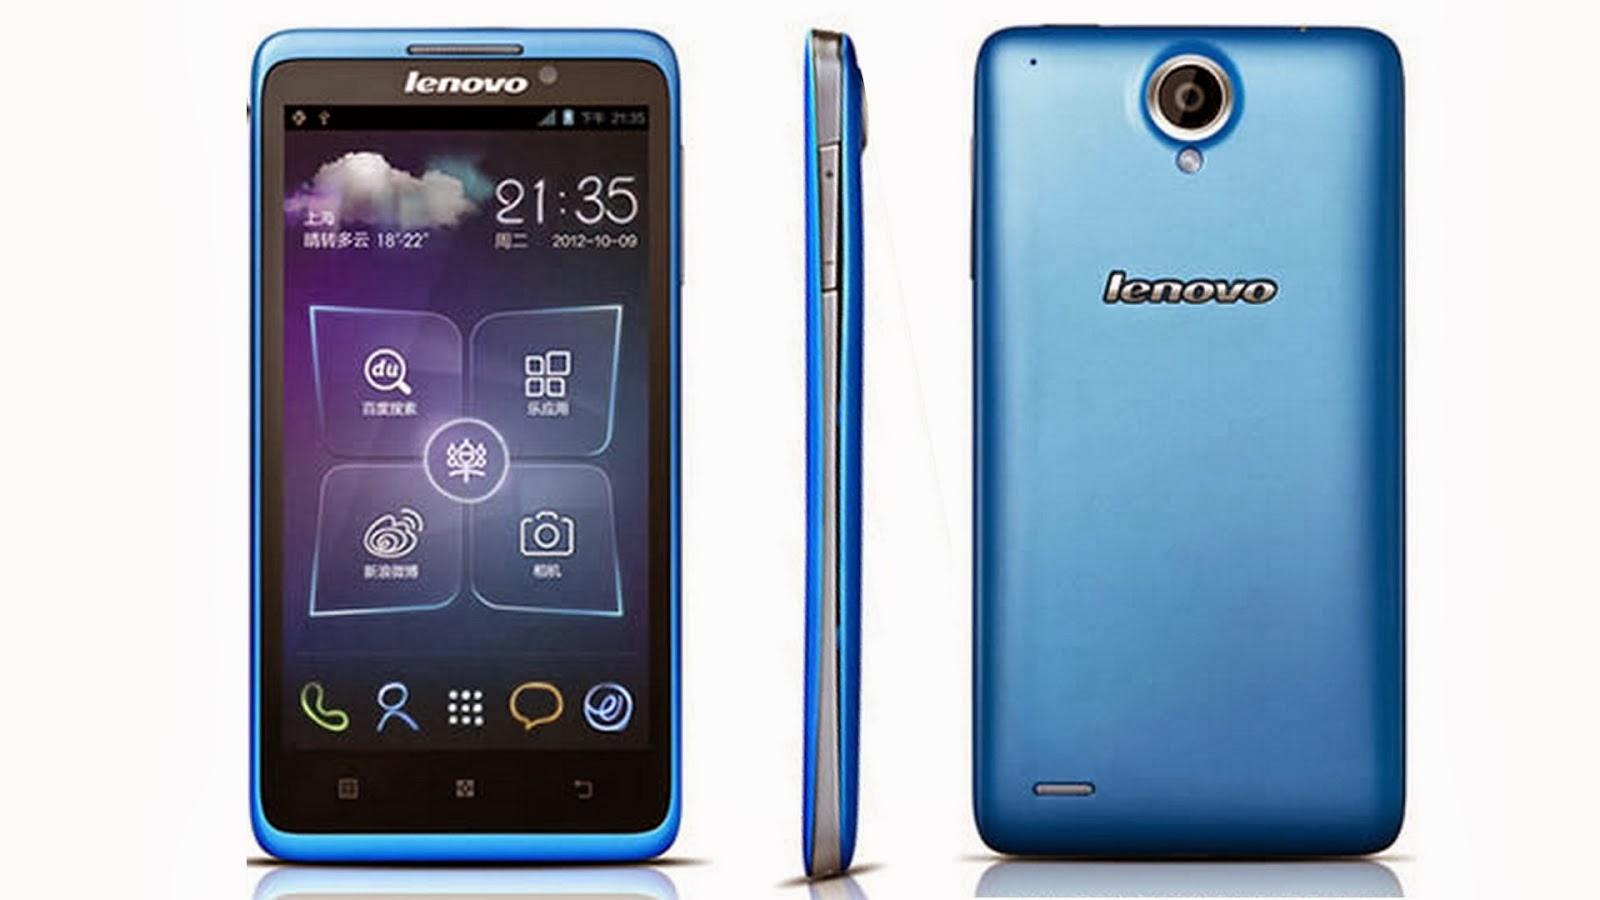 daftar harga handphone lenovo maret 2014 lenovo yoga tablet 8 1600x900